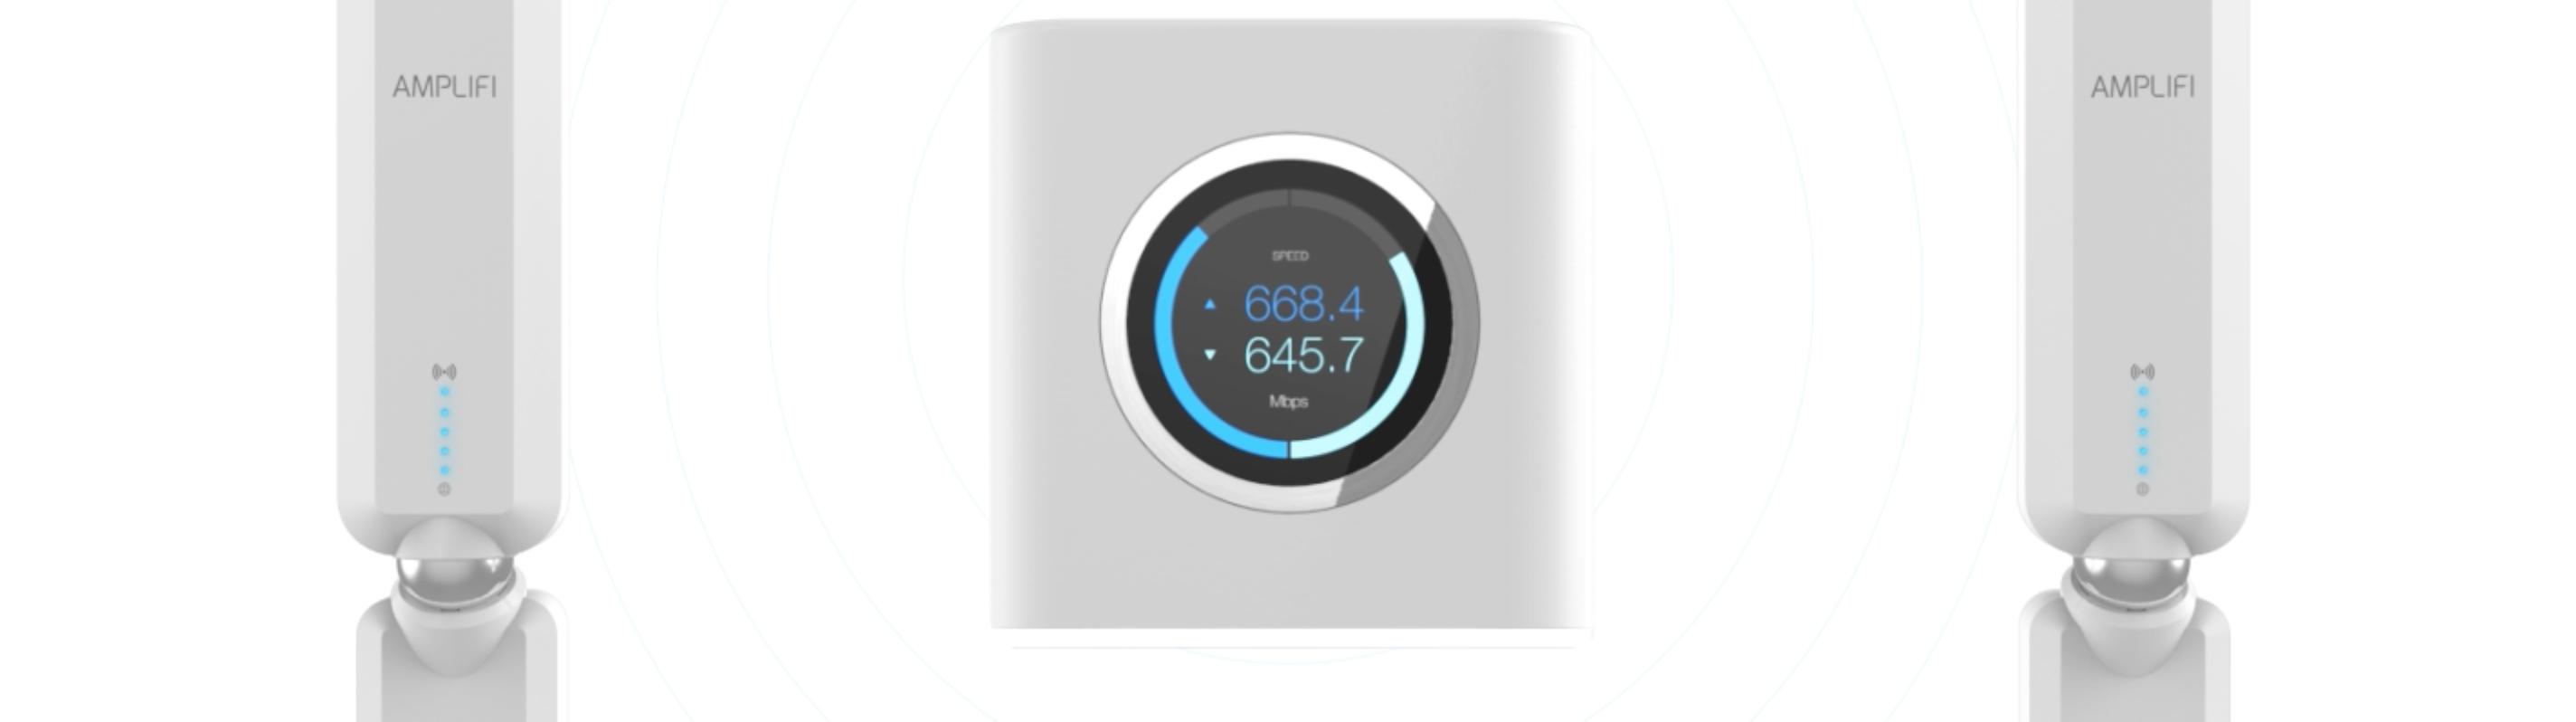 Review: Ubiquiti's Amplifi HD, mesh WiFi networking done right?